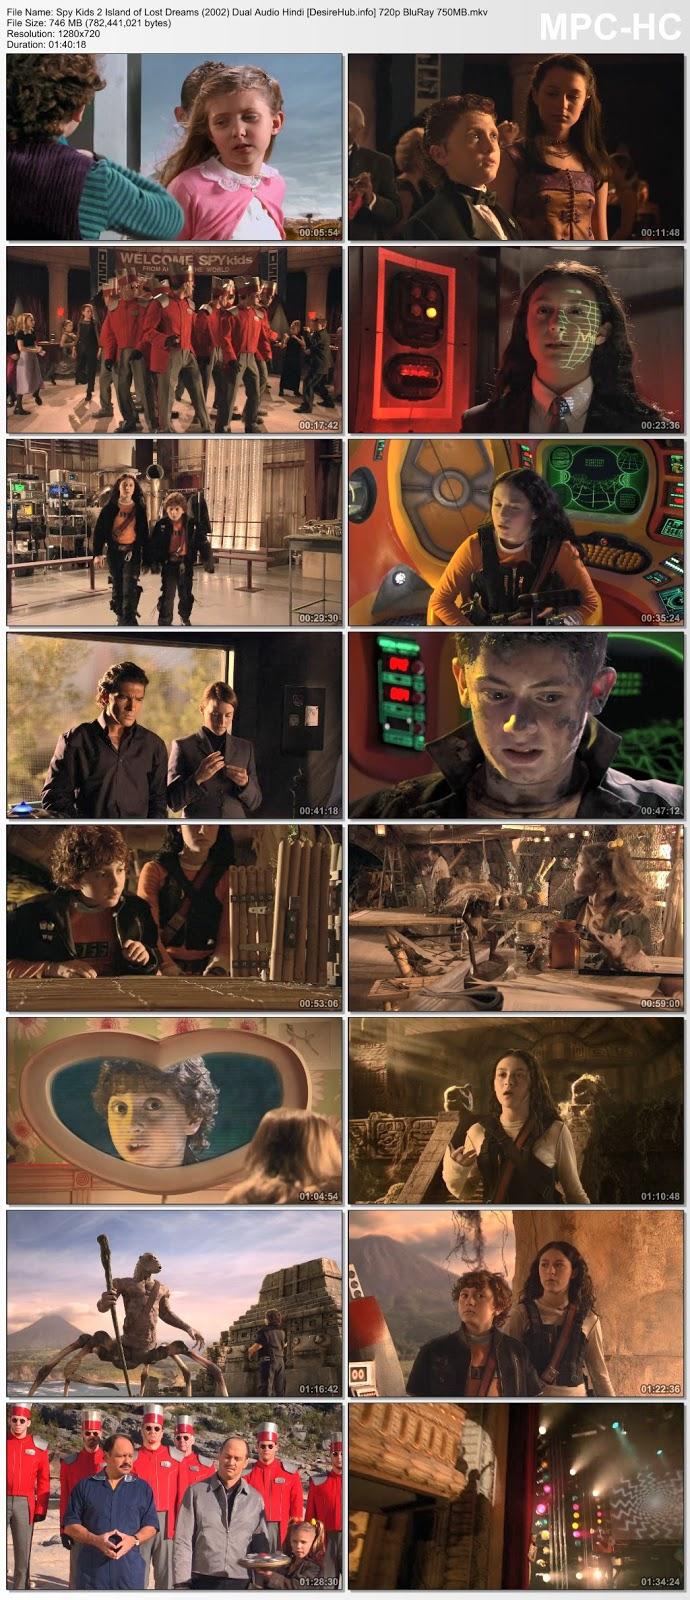 Spy Kids 2: Island of Lost Dreams (2002) Dual Audio Hindi 720p BluRay 750MB Desirehub